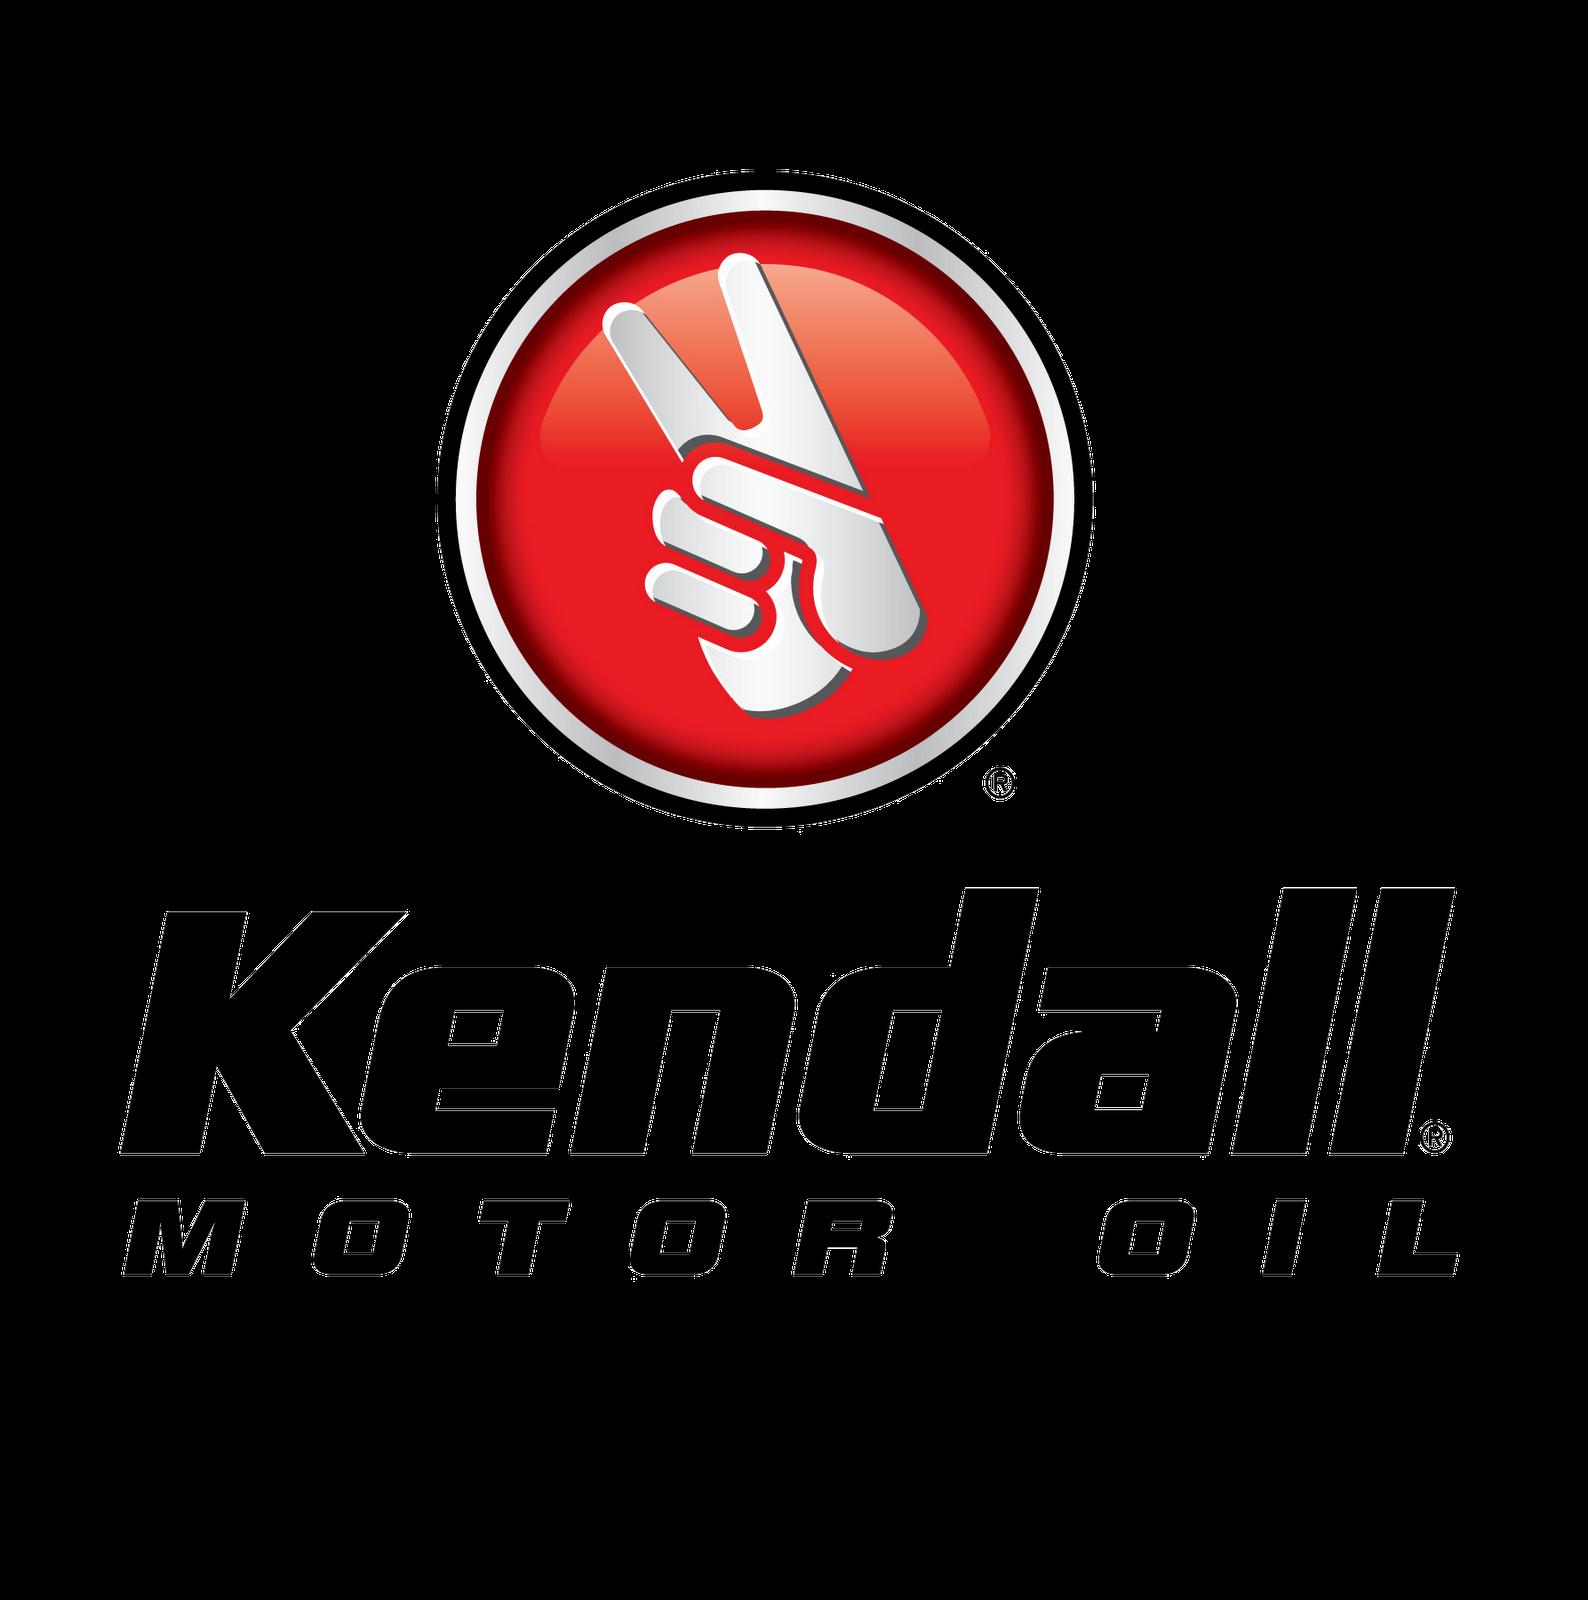 KENDALL_4C_vert_MotorOil